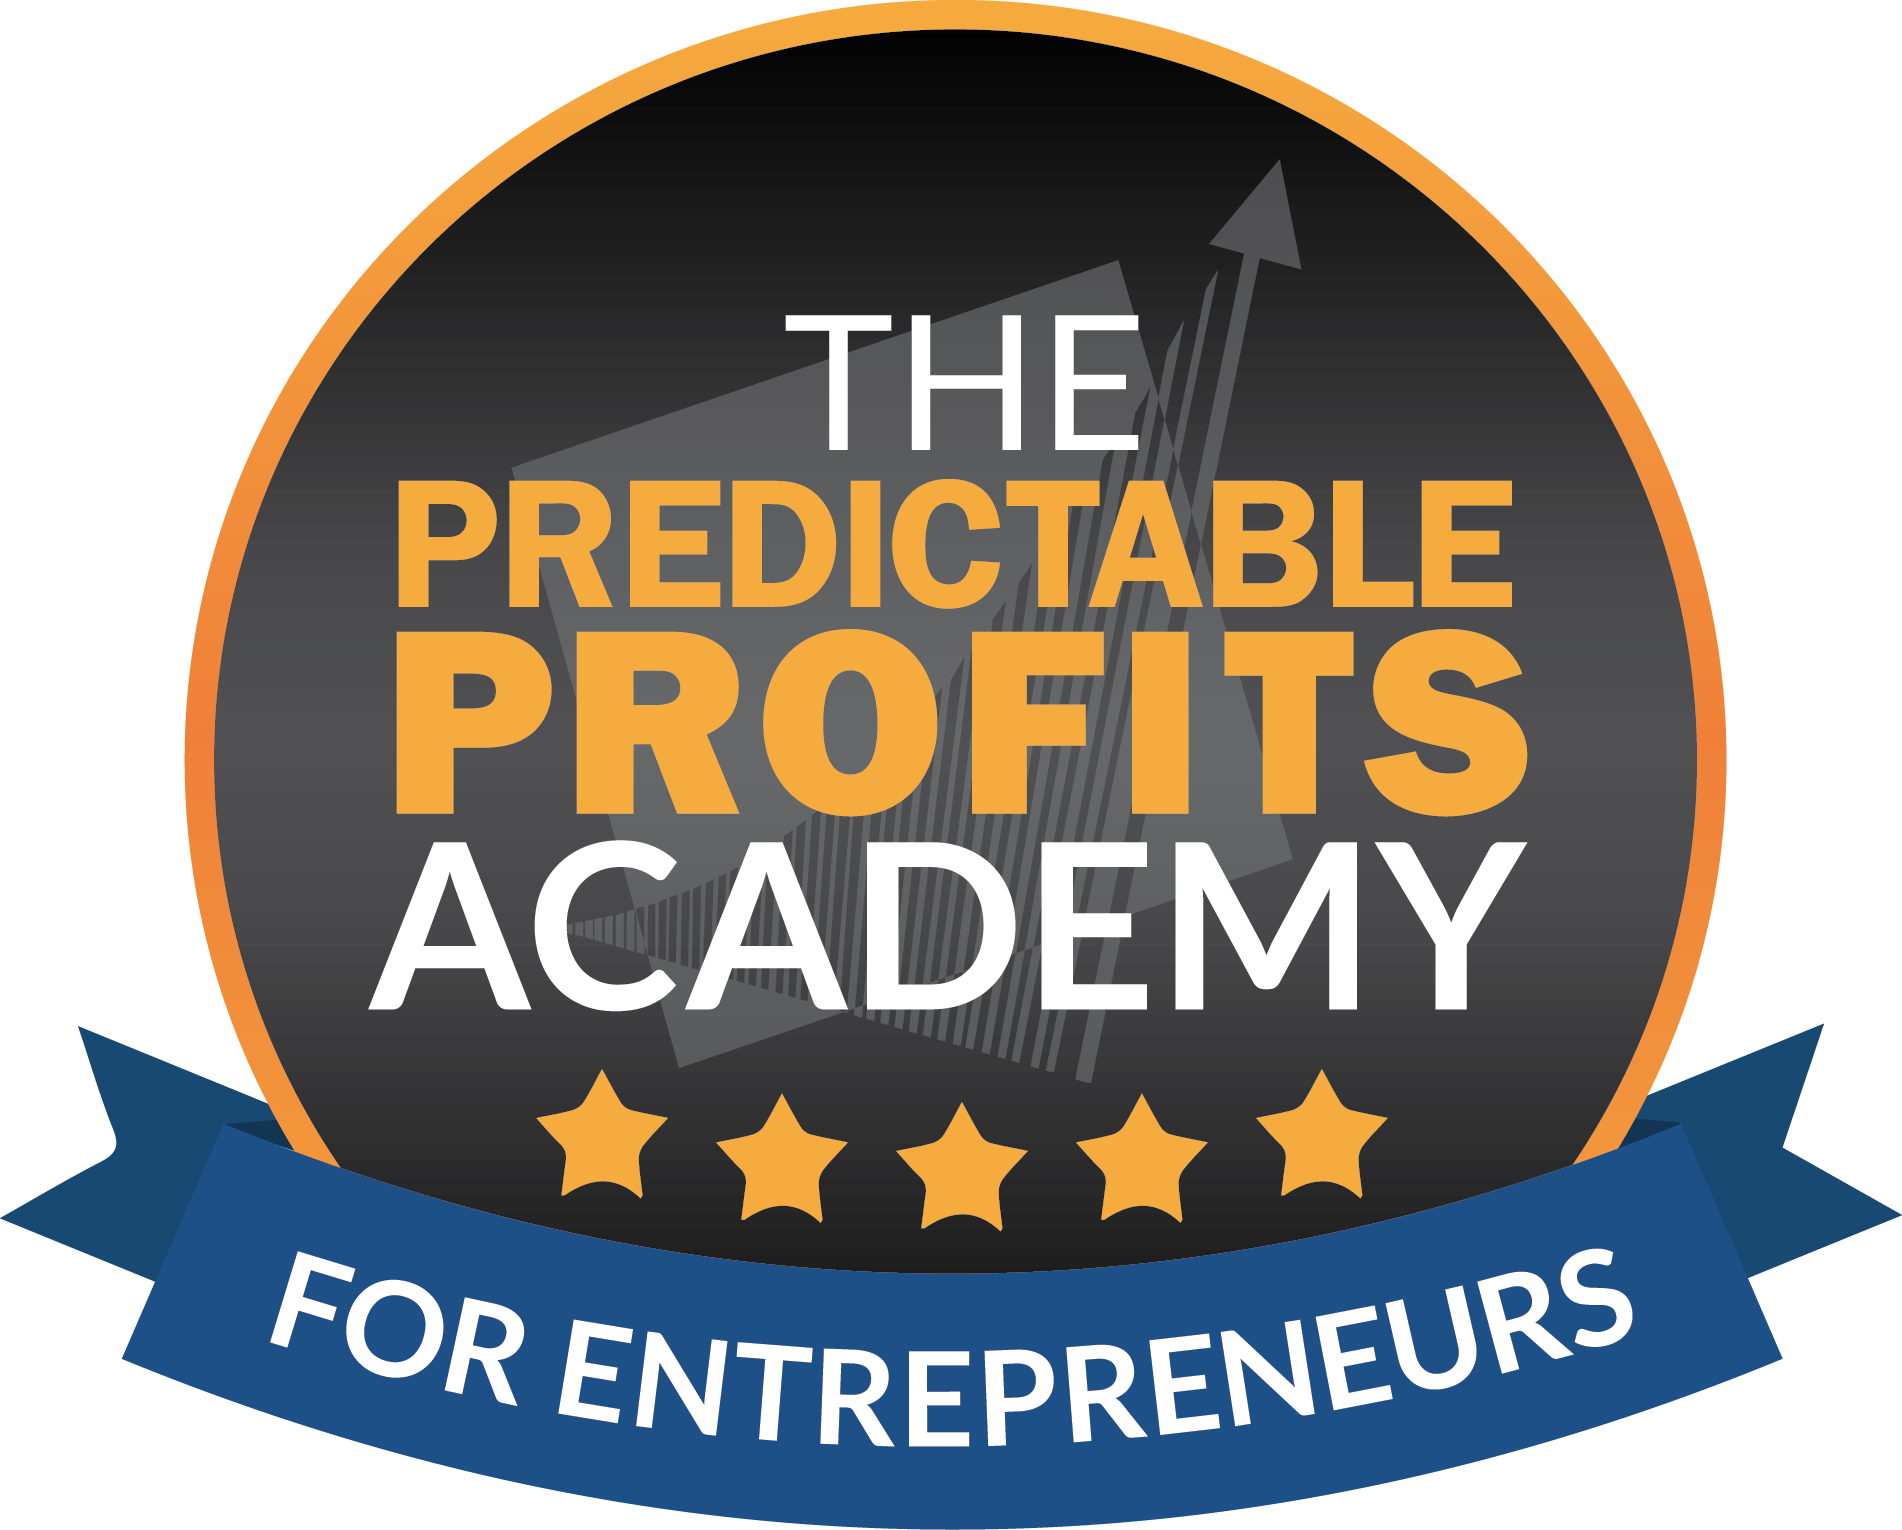 PredictableProfitsAcademy_logo